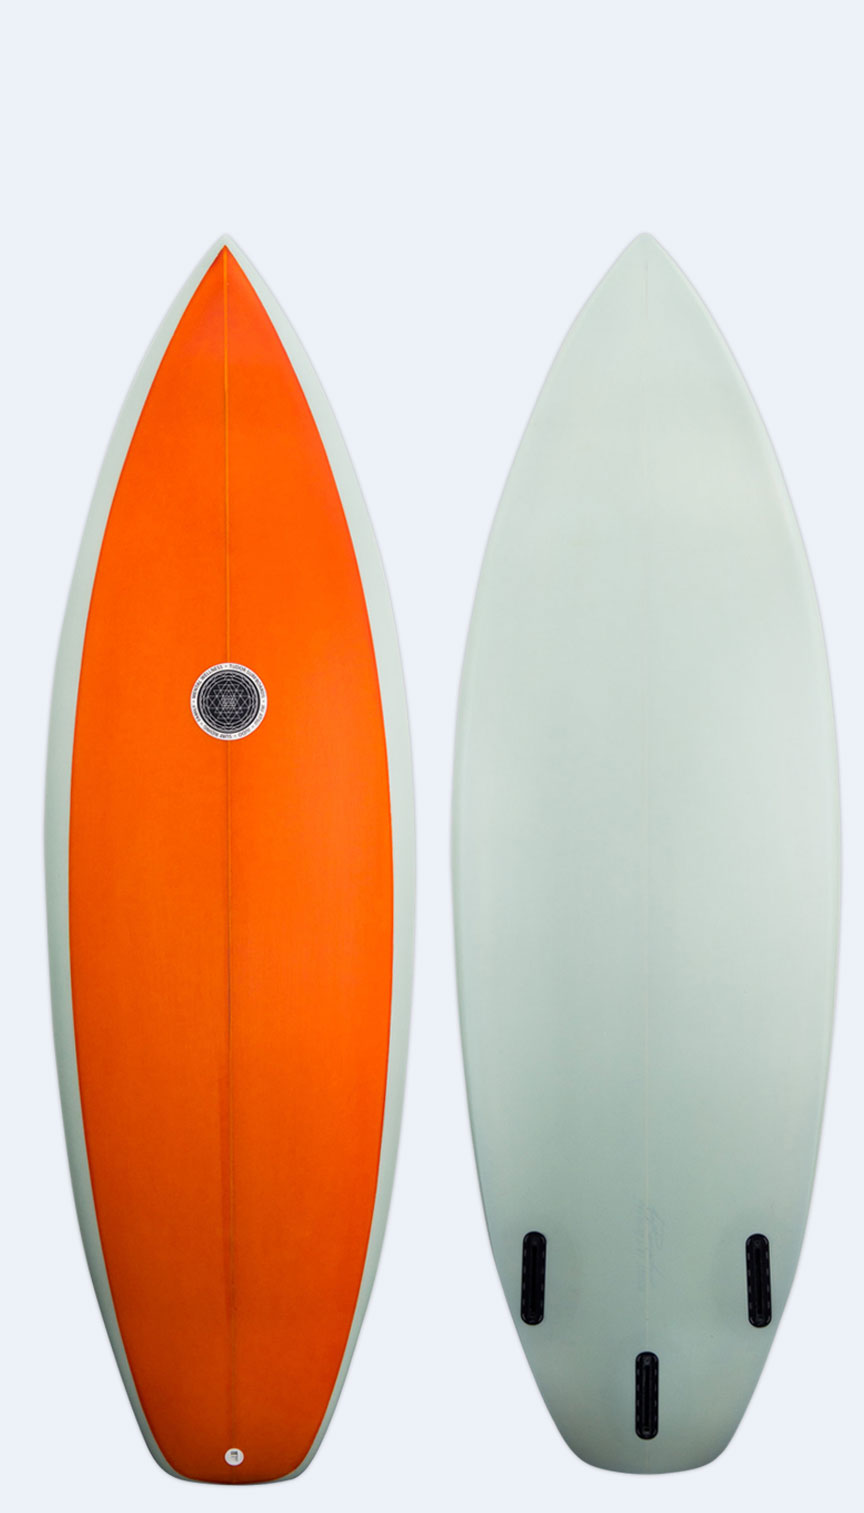 tudor-surfboards-80-tri